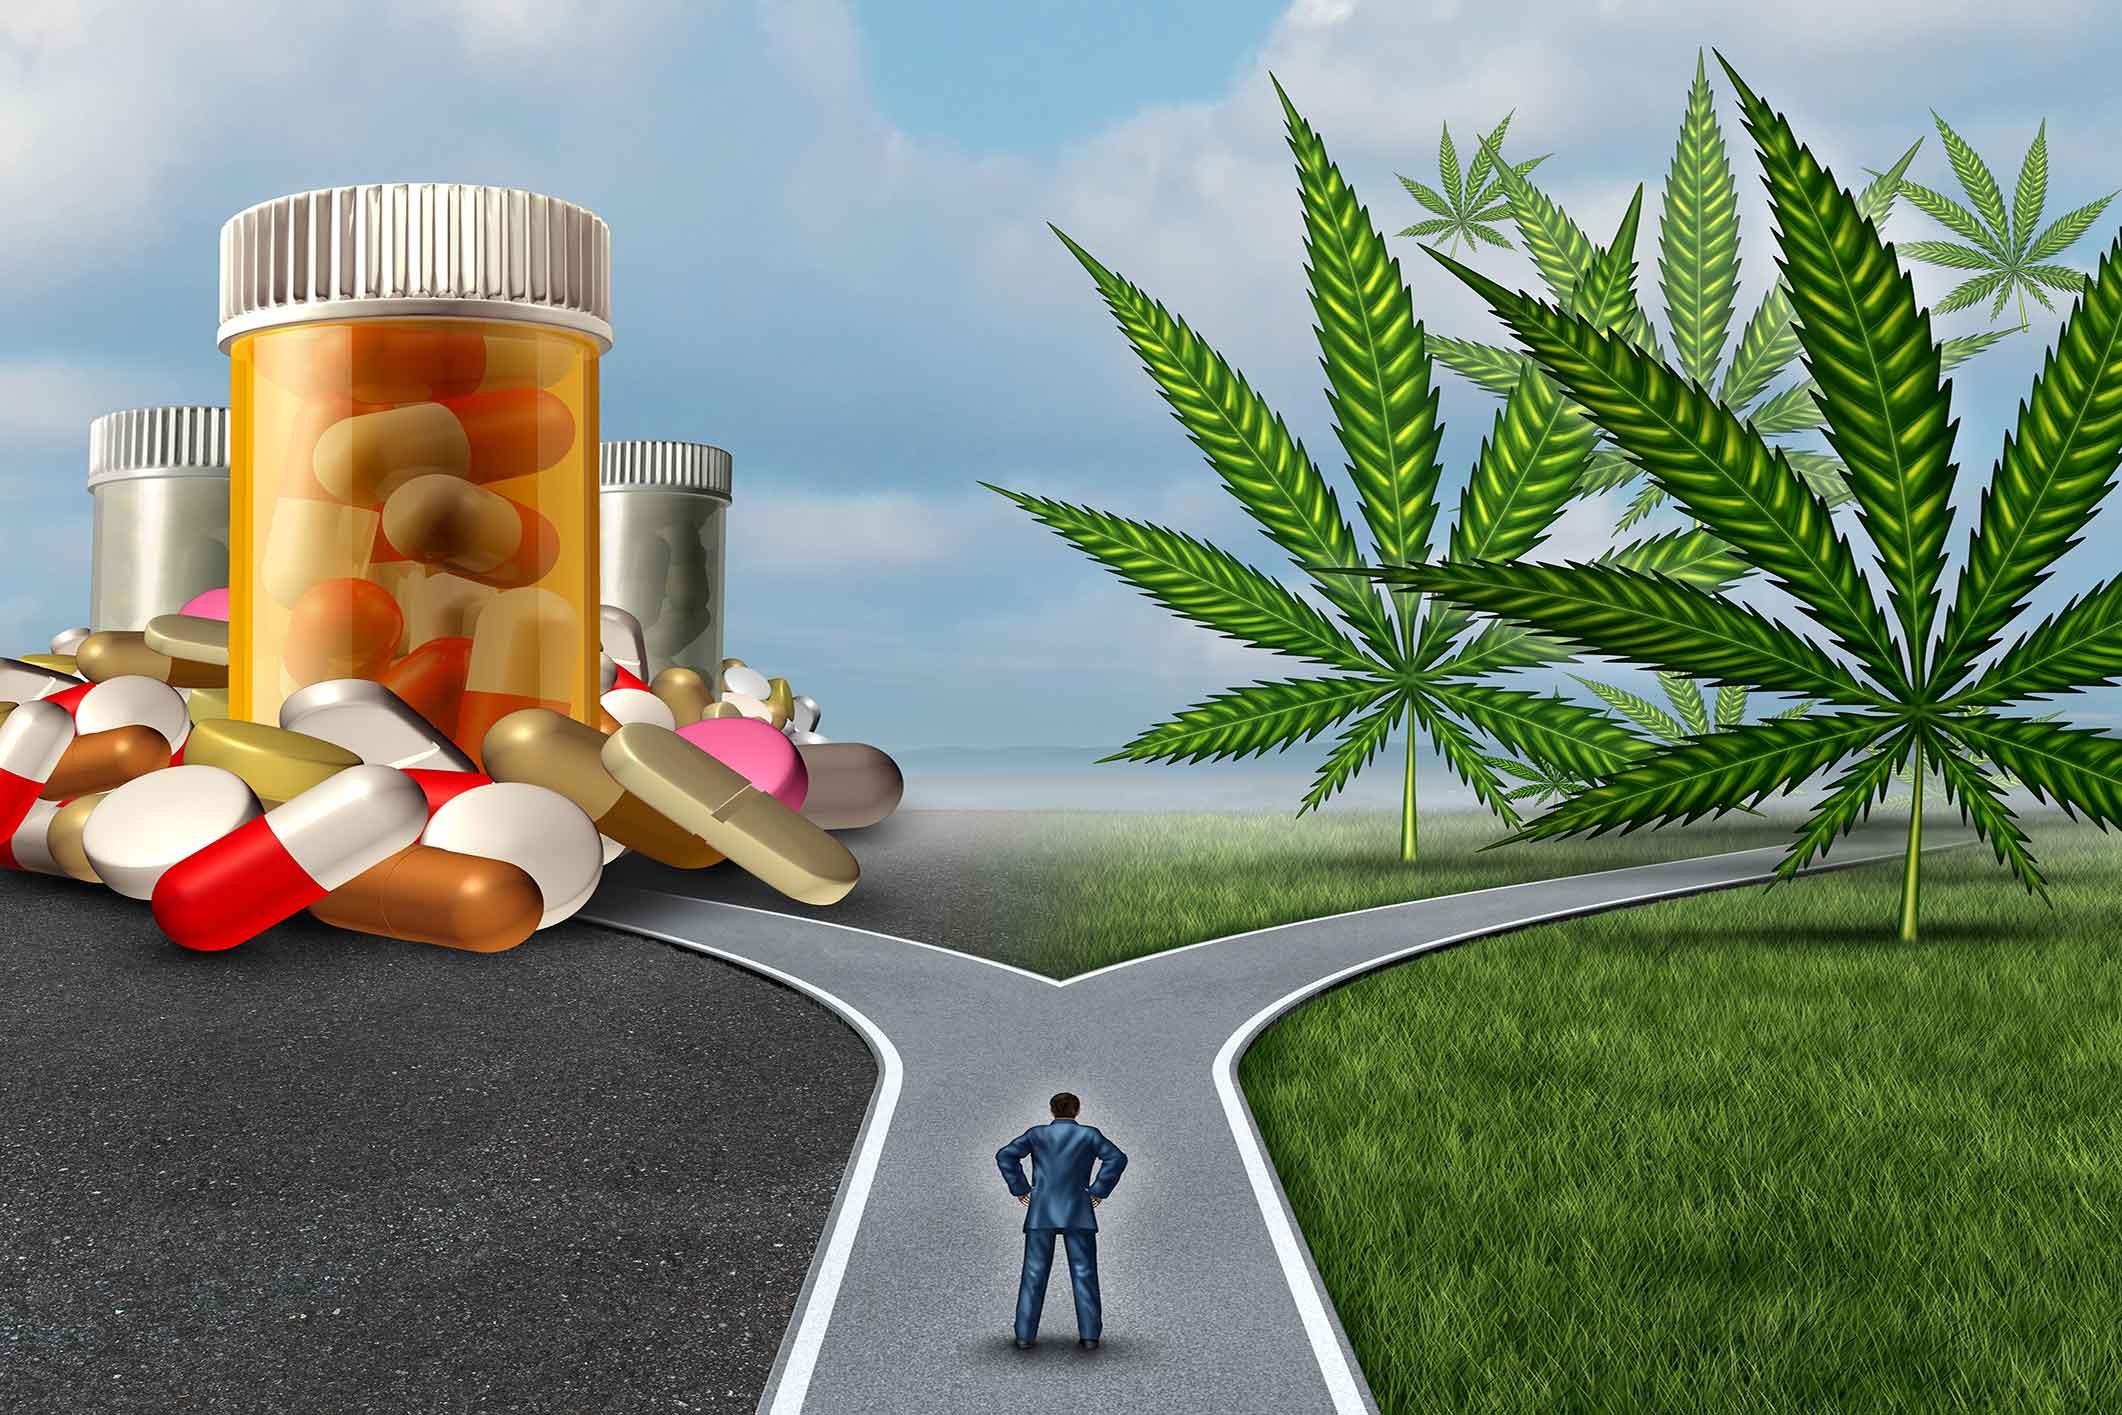 marijuana a gateway drug? - medical marijuana of southern california